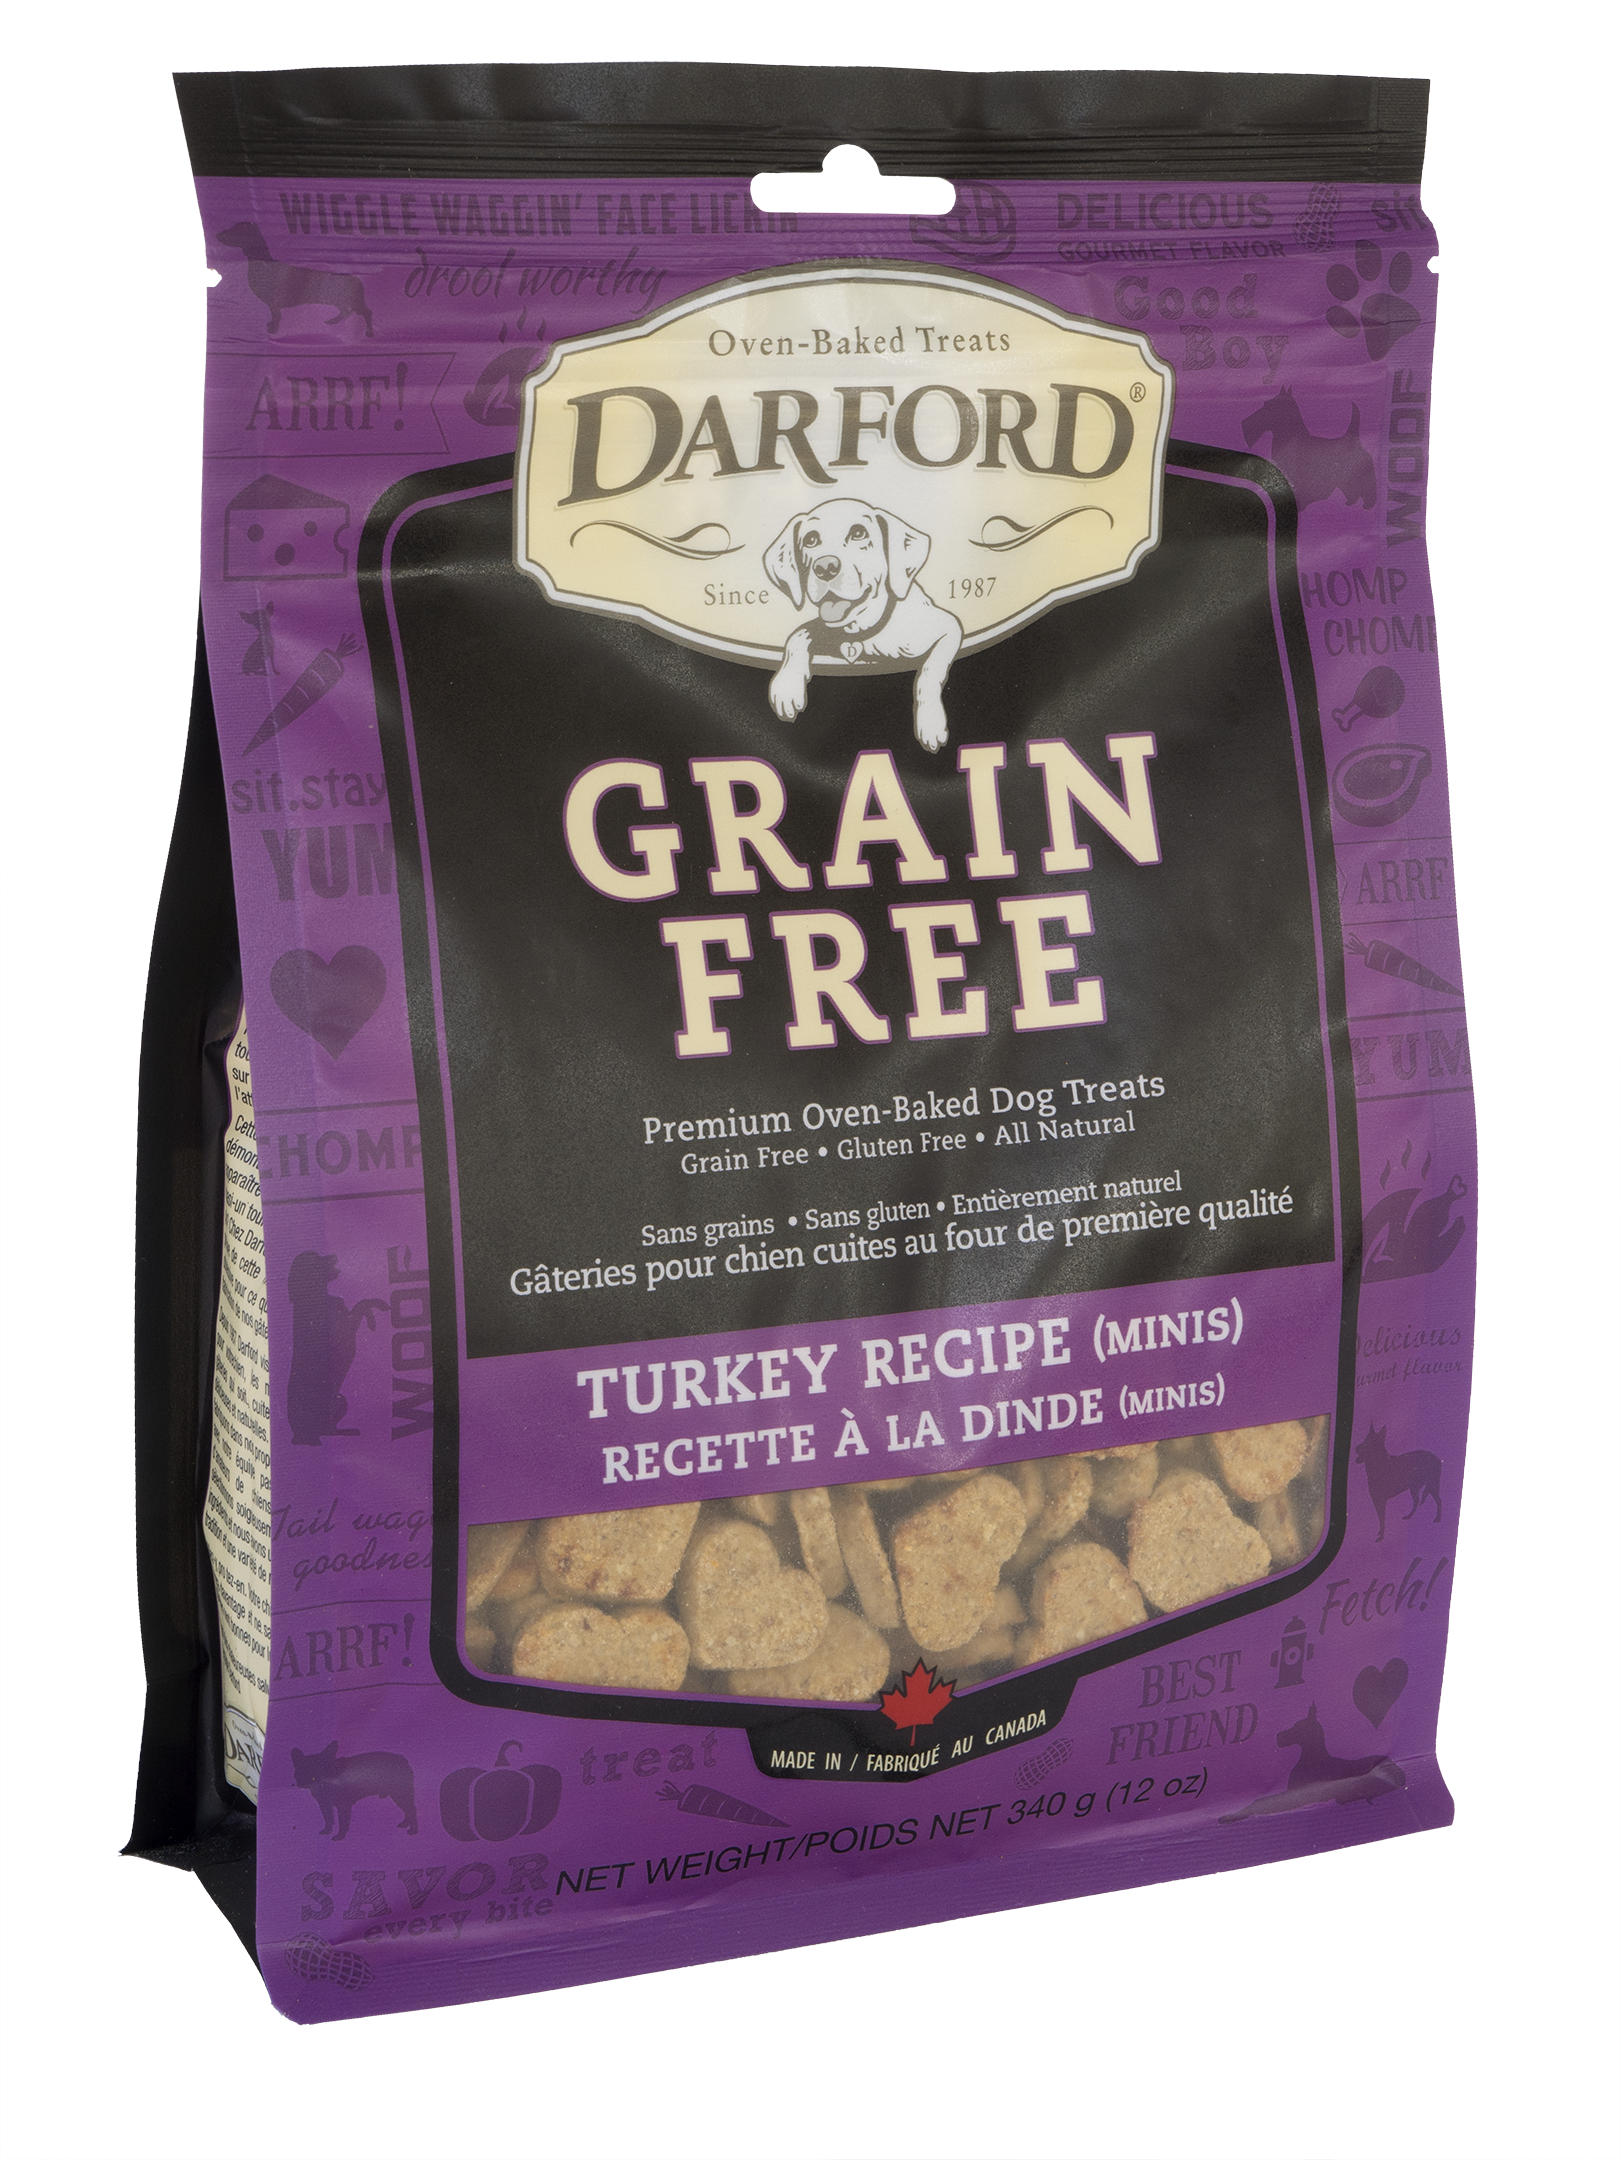 Darford Baked Turkey Recipe with Mixed Vegetables Grain-Free Mini Dog Treats, 12-oz bag